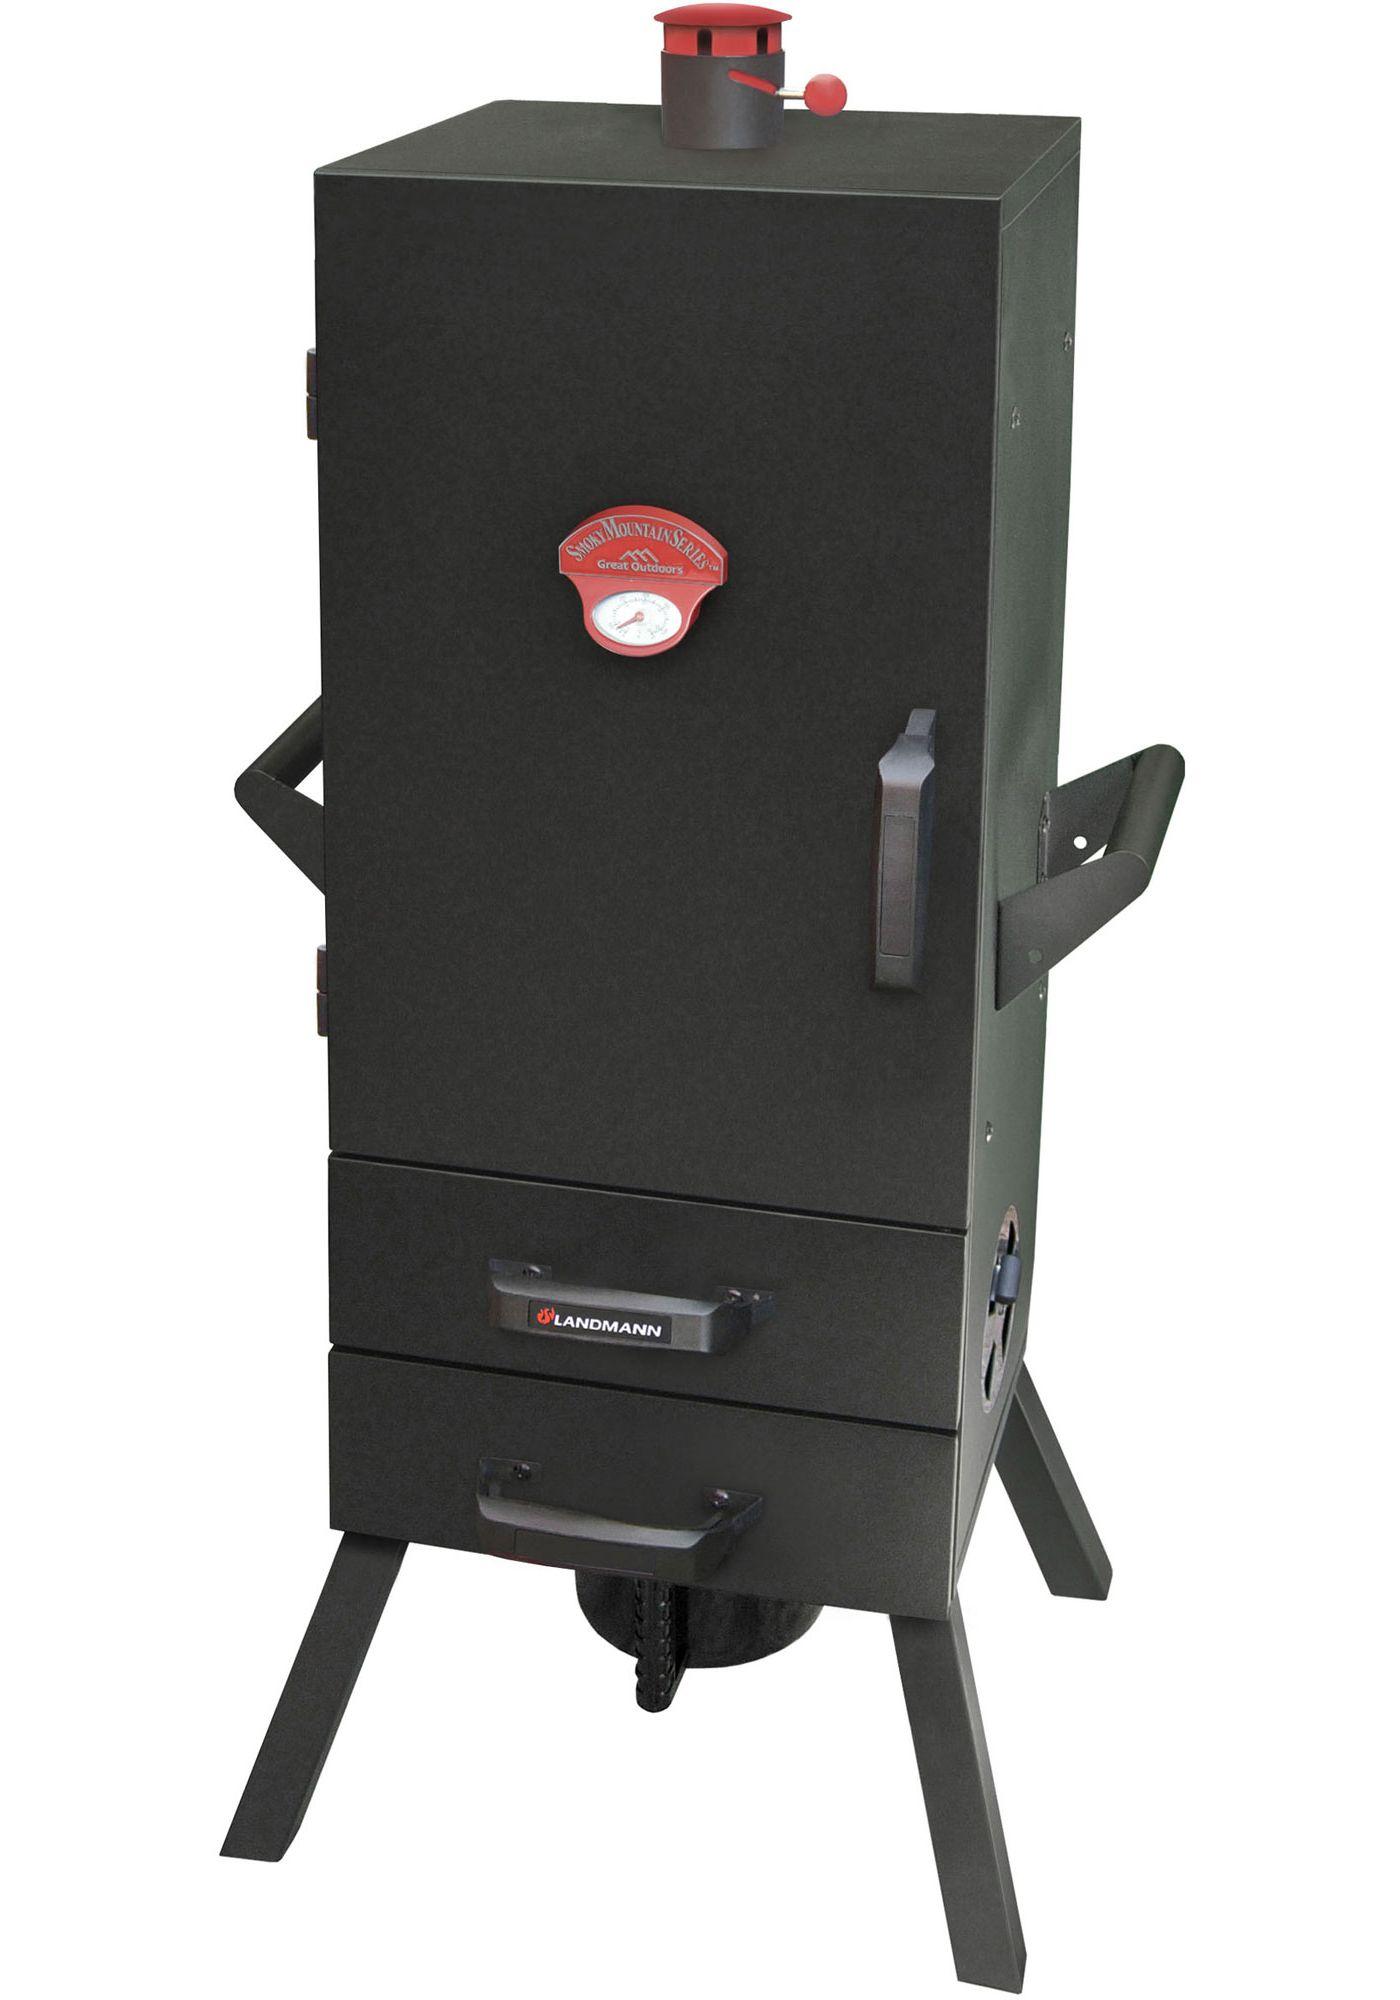 "Landmann; 24"" Two-Drawer Vertical Charcoal Smoker"